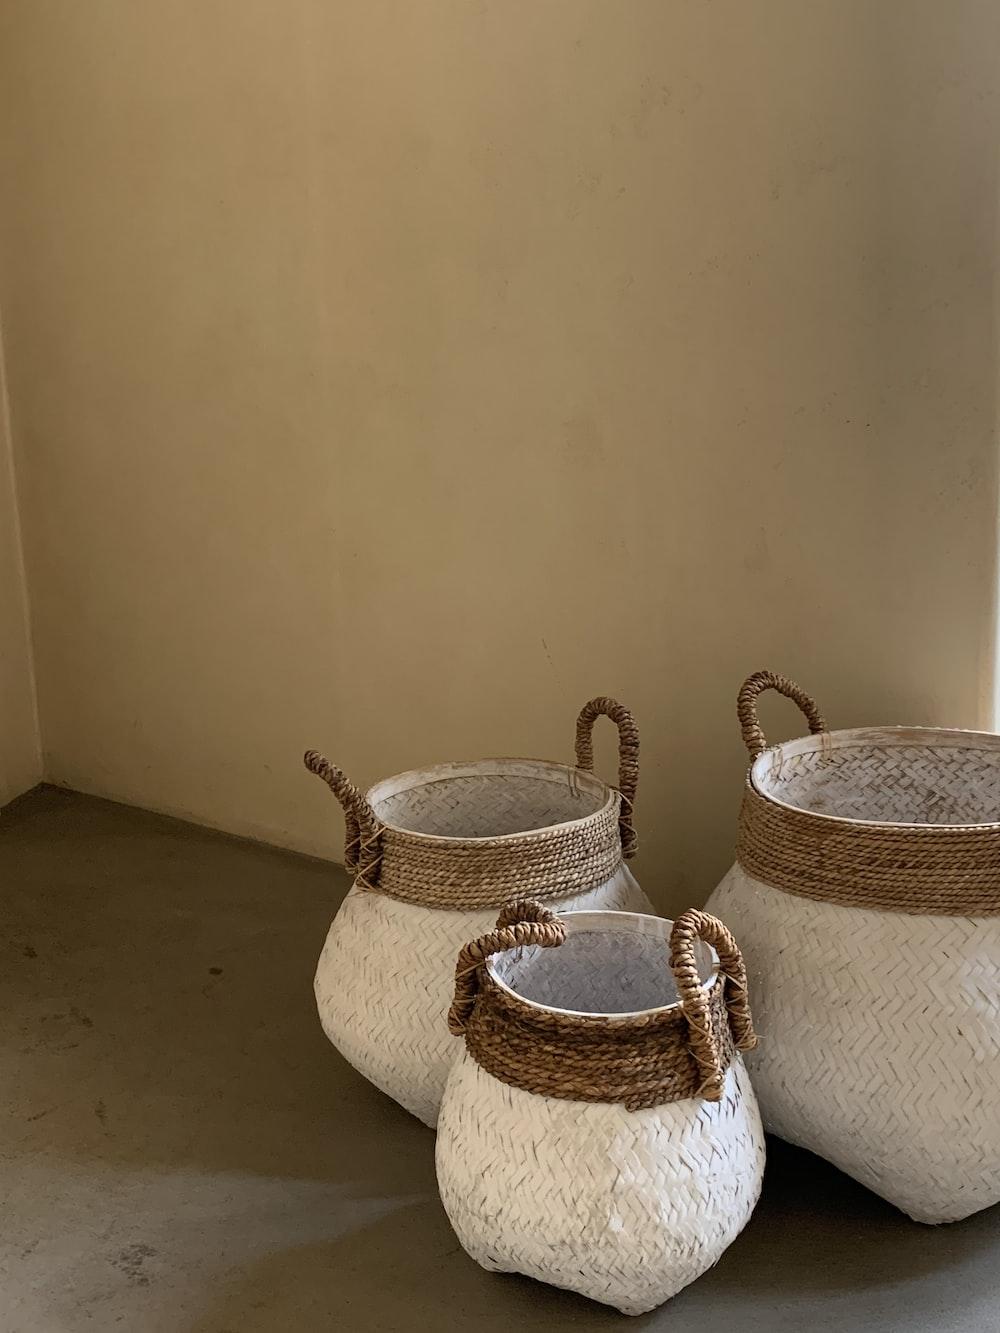 brown woven baskets on brown wooden floor